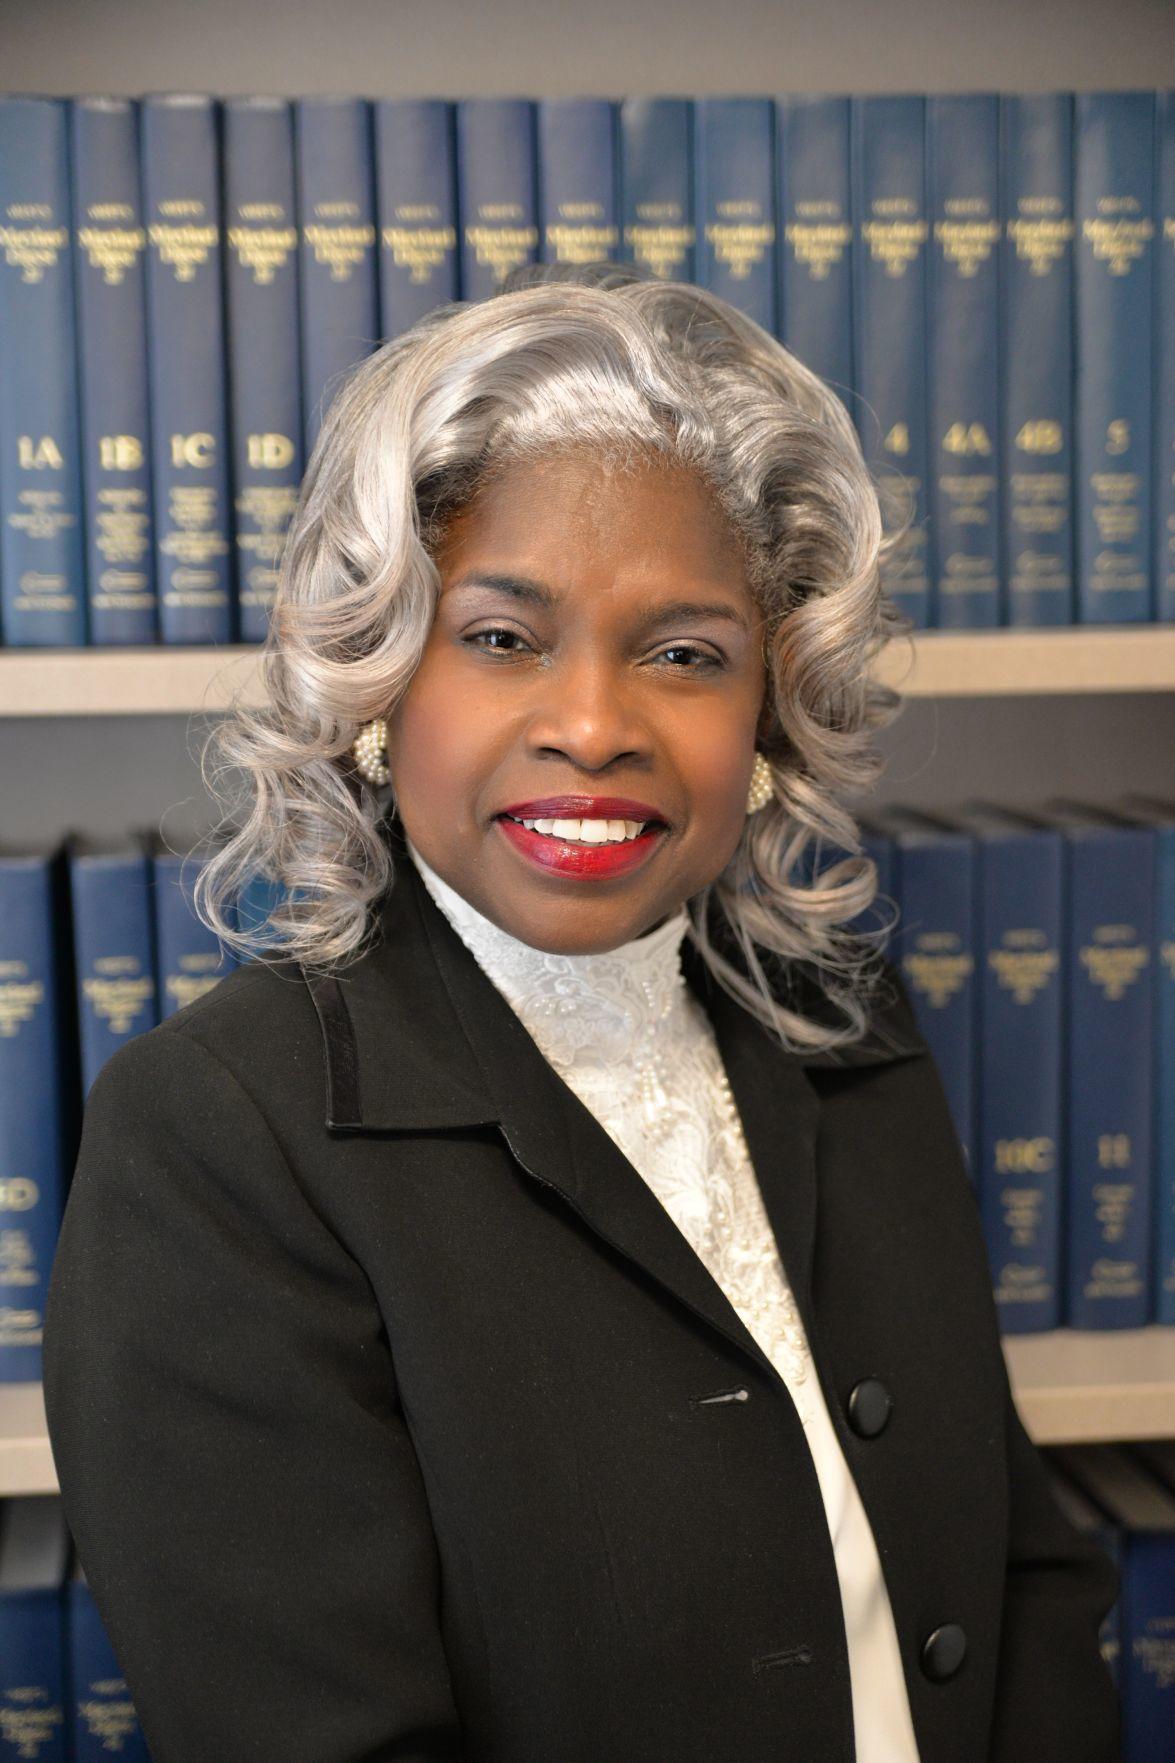 Waldorf lawyer makes run for circuit court judge seat